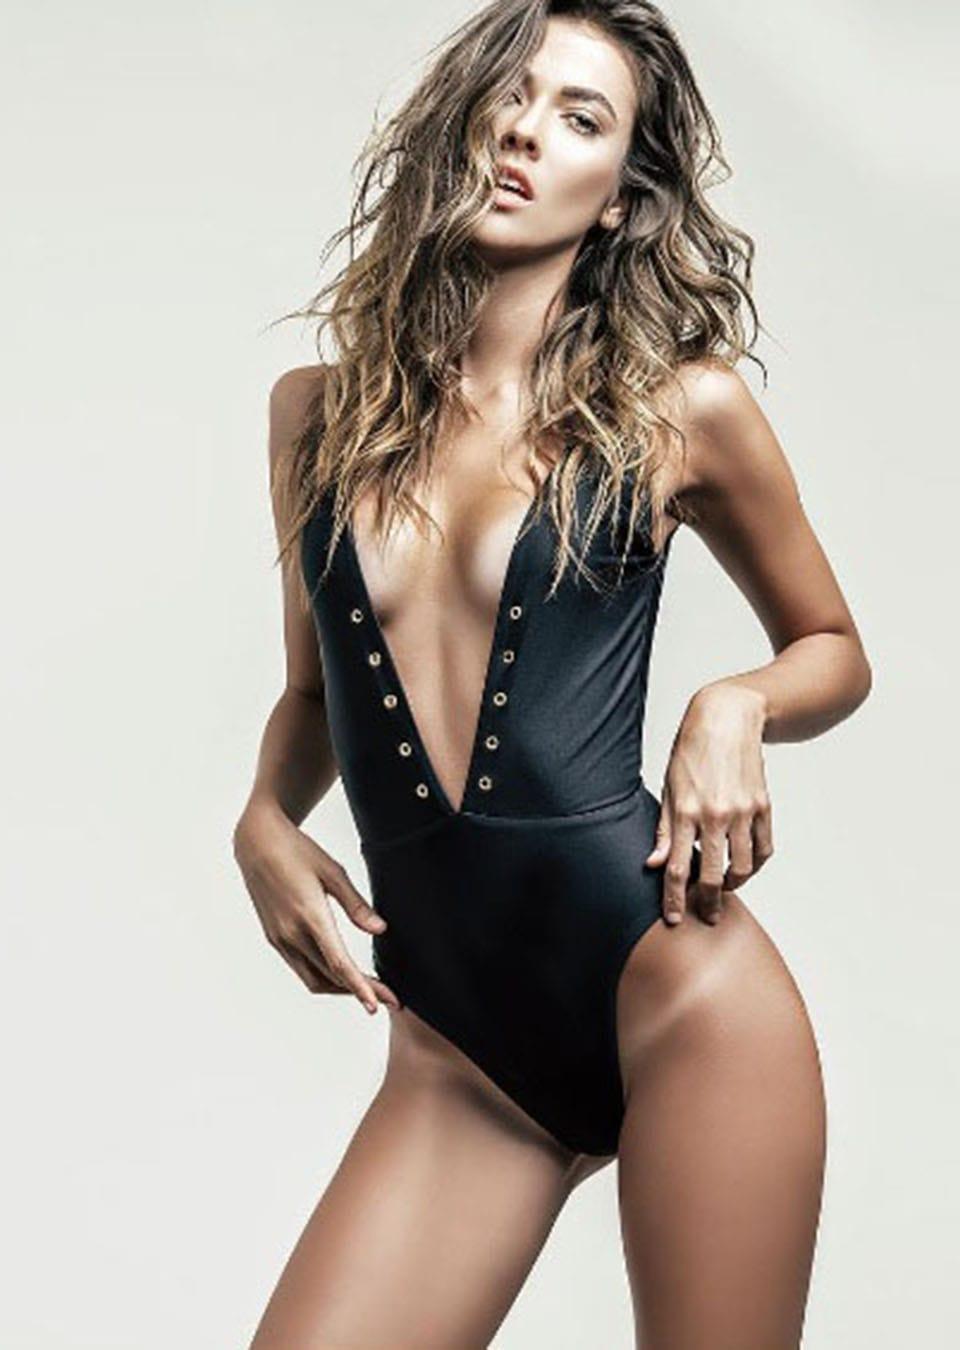 ICloud Marly Velasquez naked (34 photos), Tits, Hot, Selfie, lingerie 2018